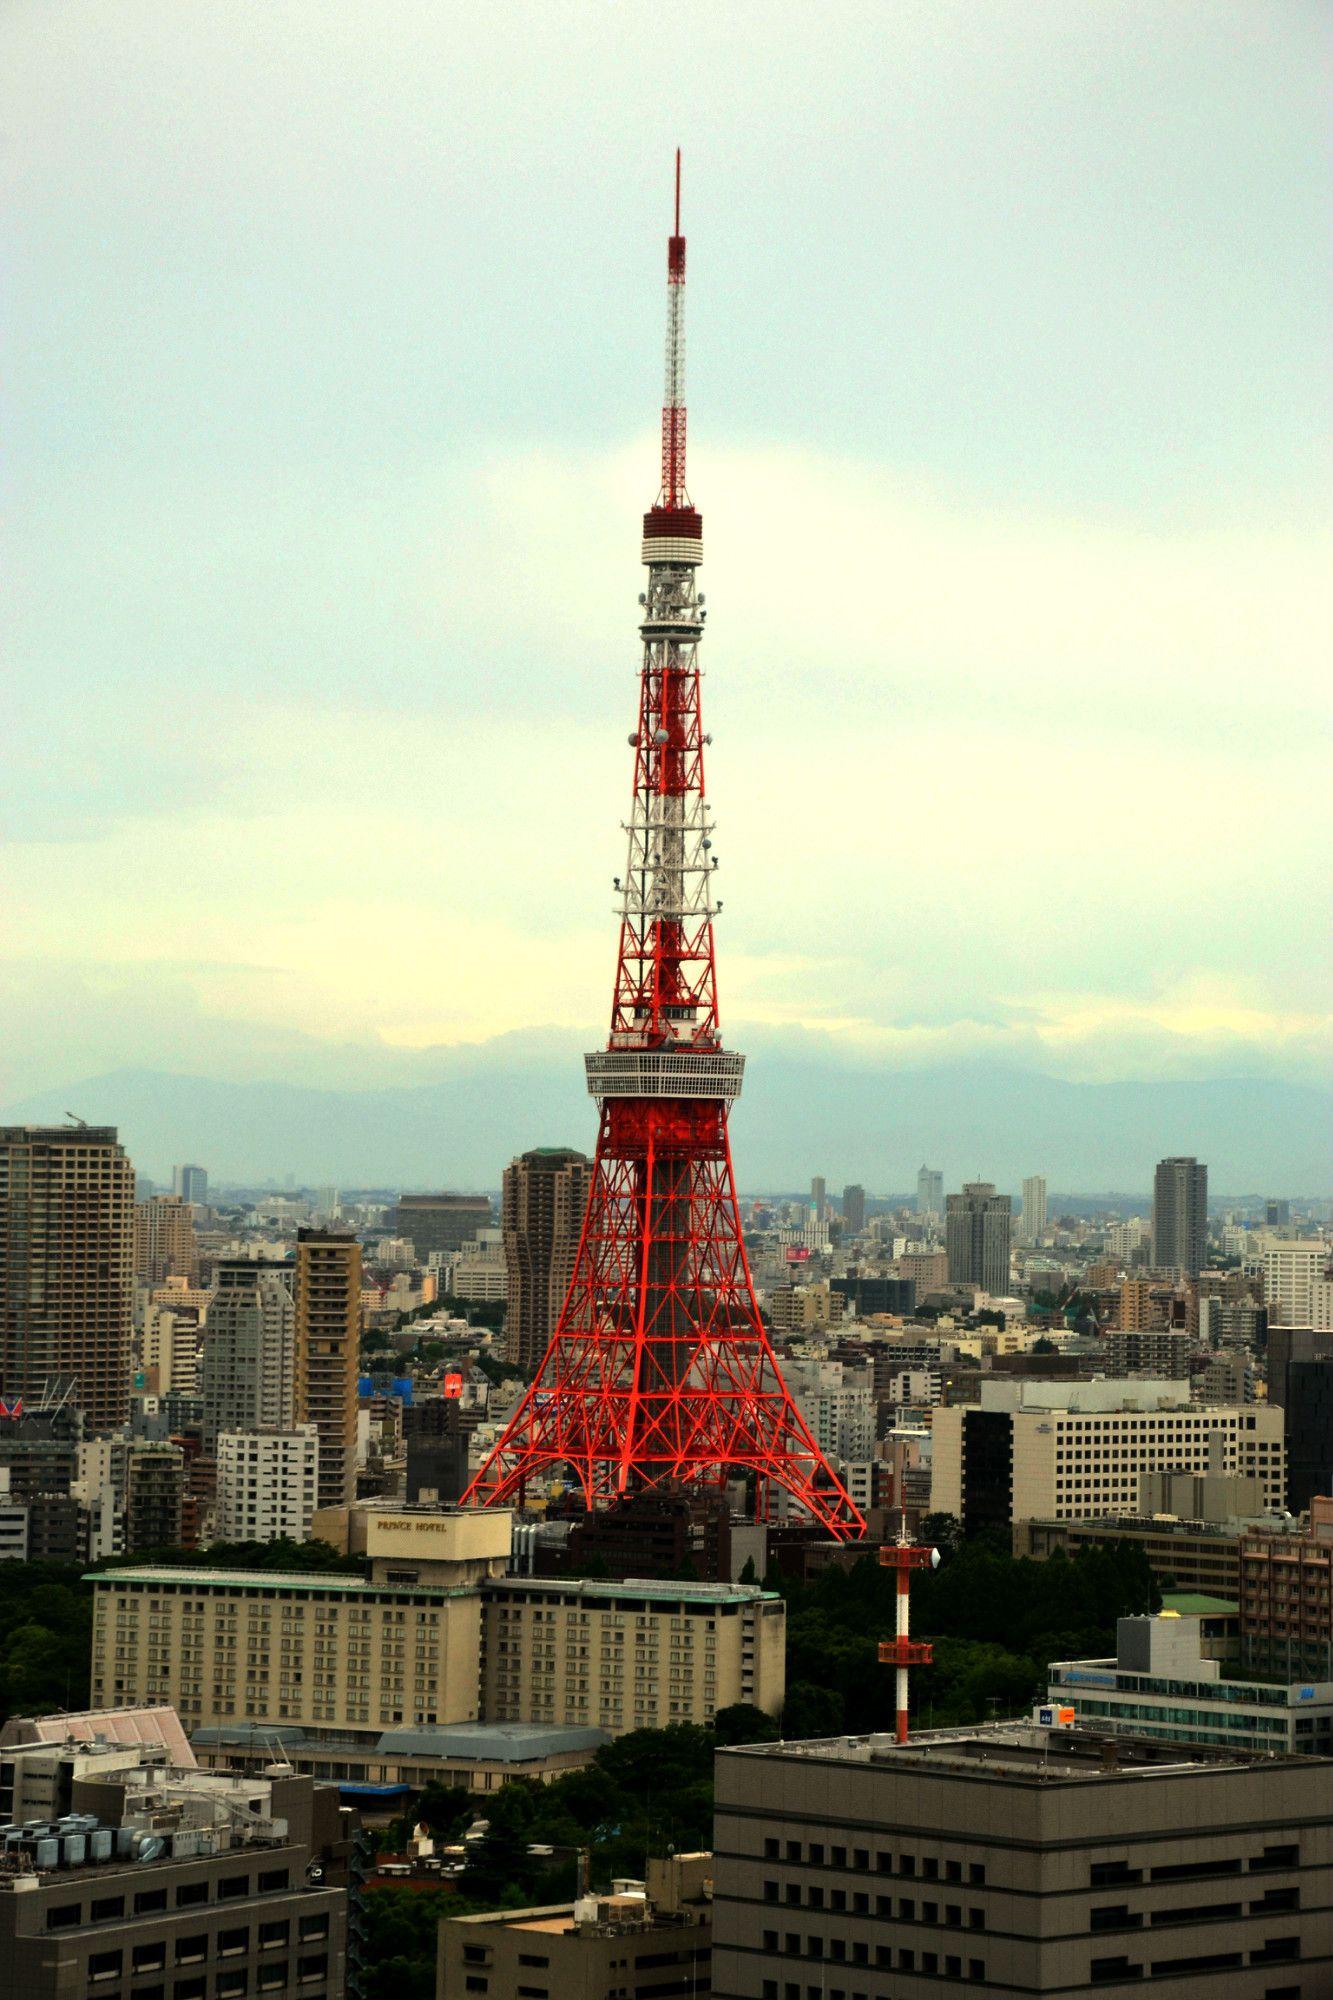 #Tokyo #Skytree #Summer #2015 #ParkHotel